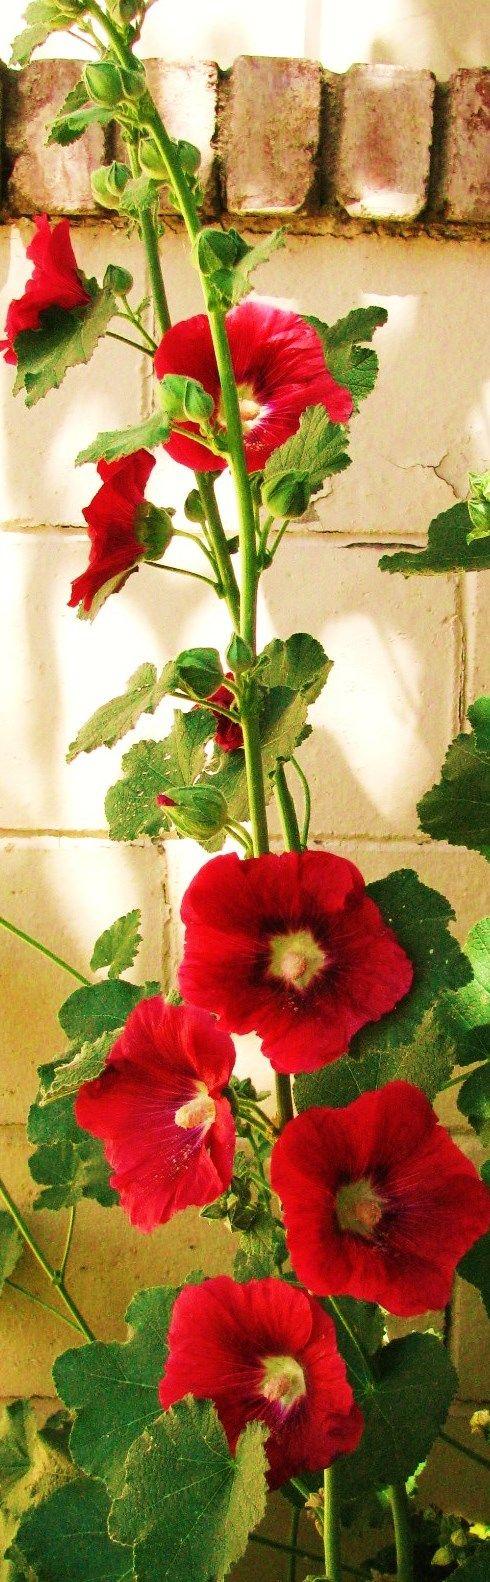 photo: beautiful red hollyhocks against cream colored bricks ...